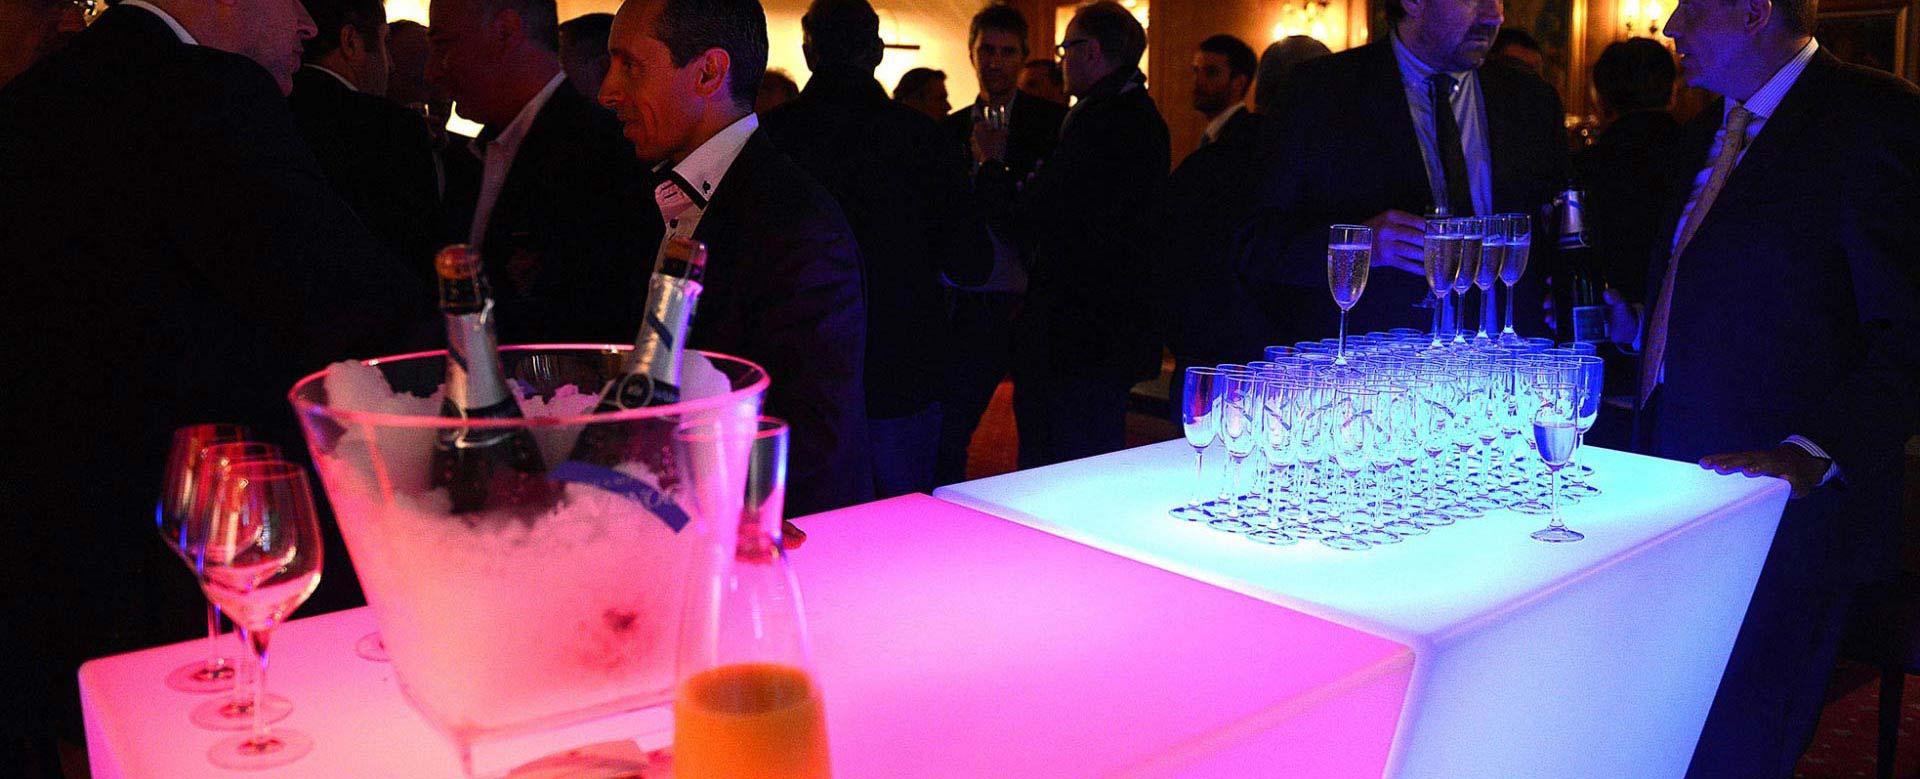 Service professionnel - Seaux a champagne lumineux ...